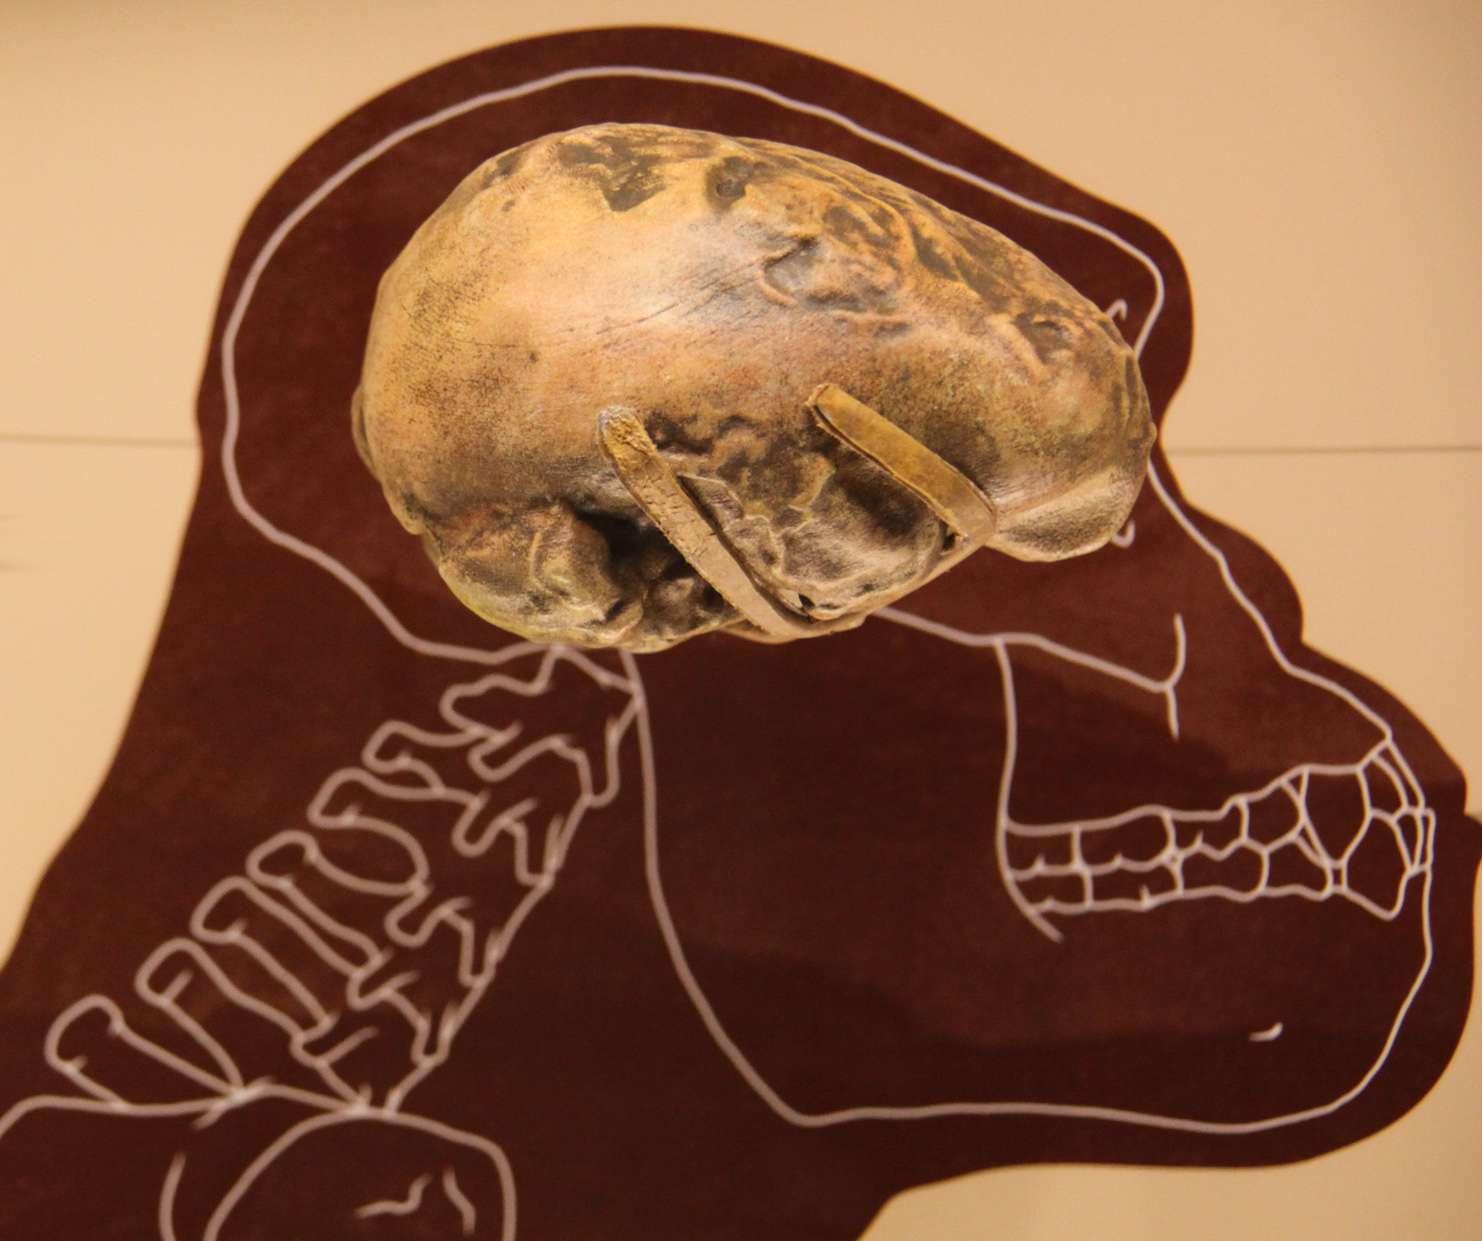 brain size of Australopithecus afarensis